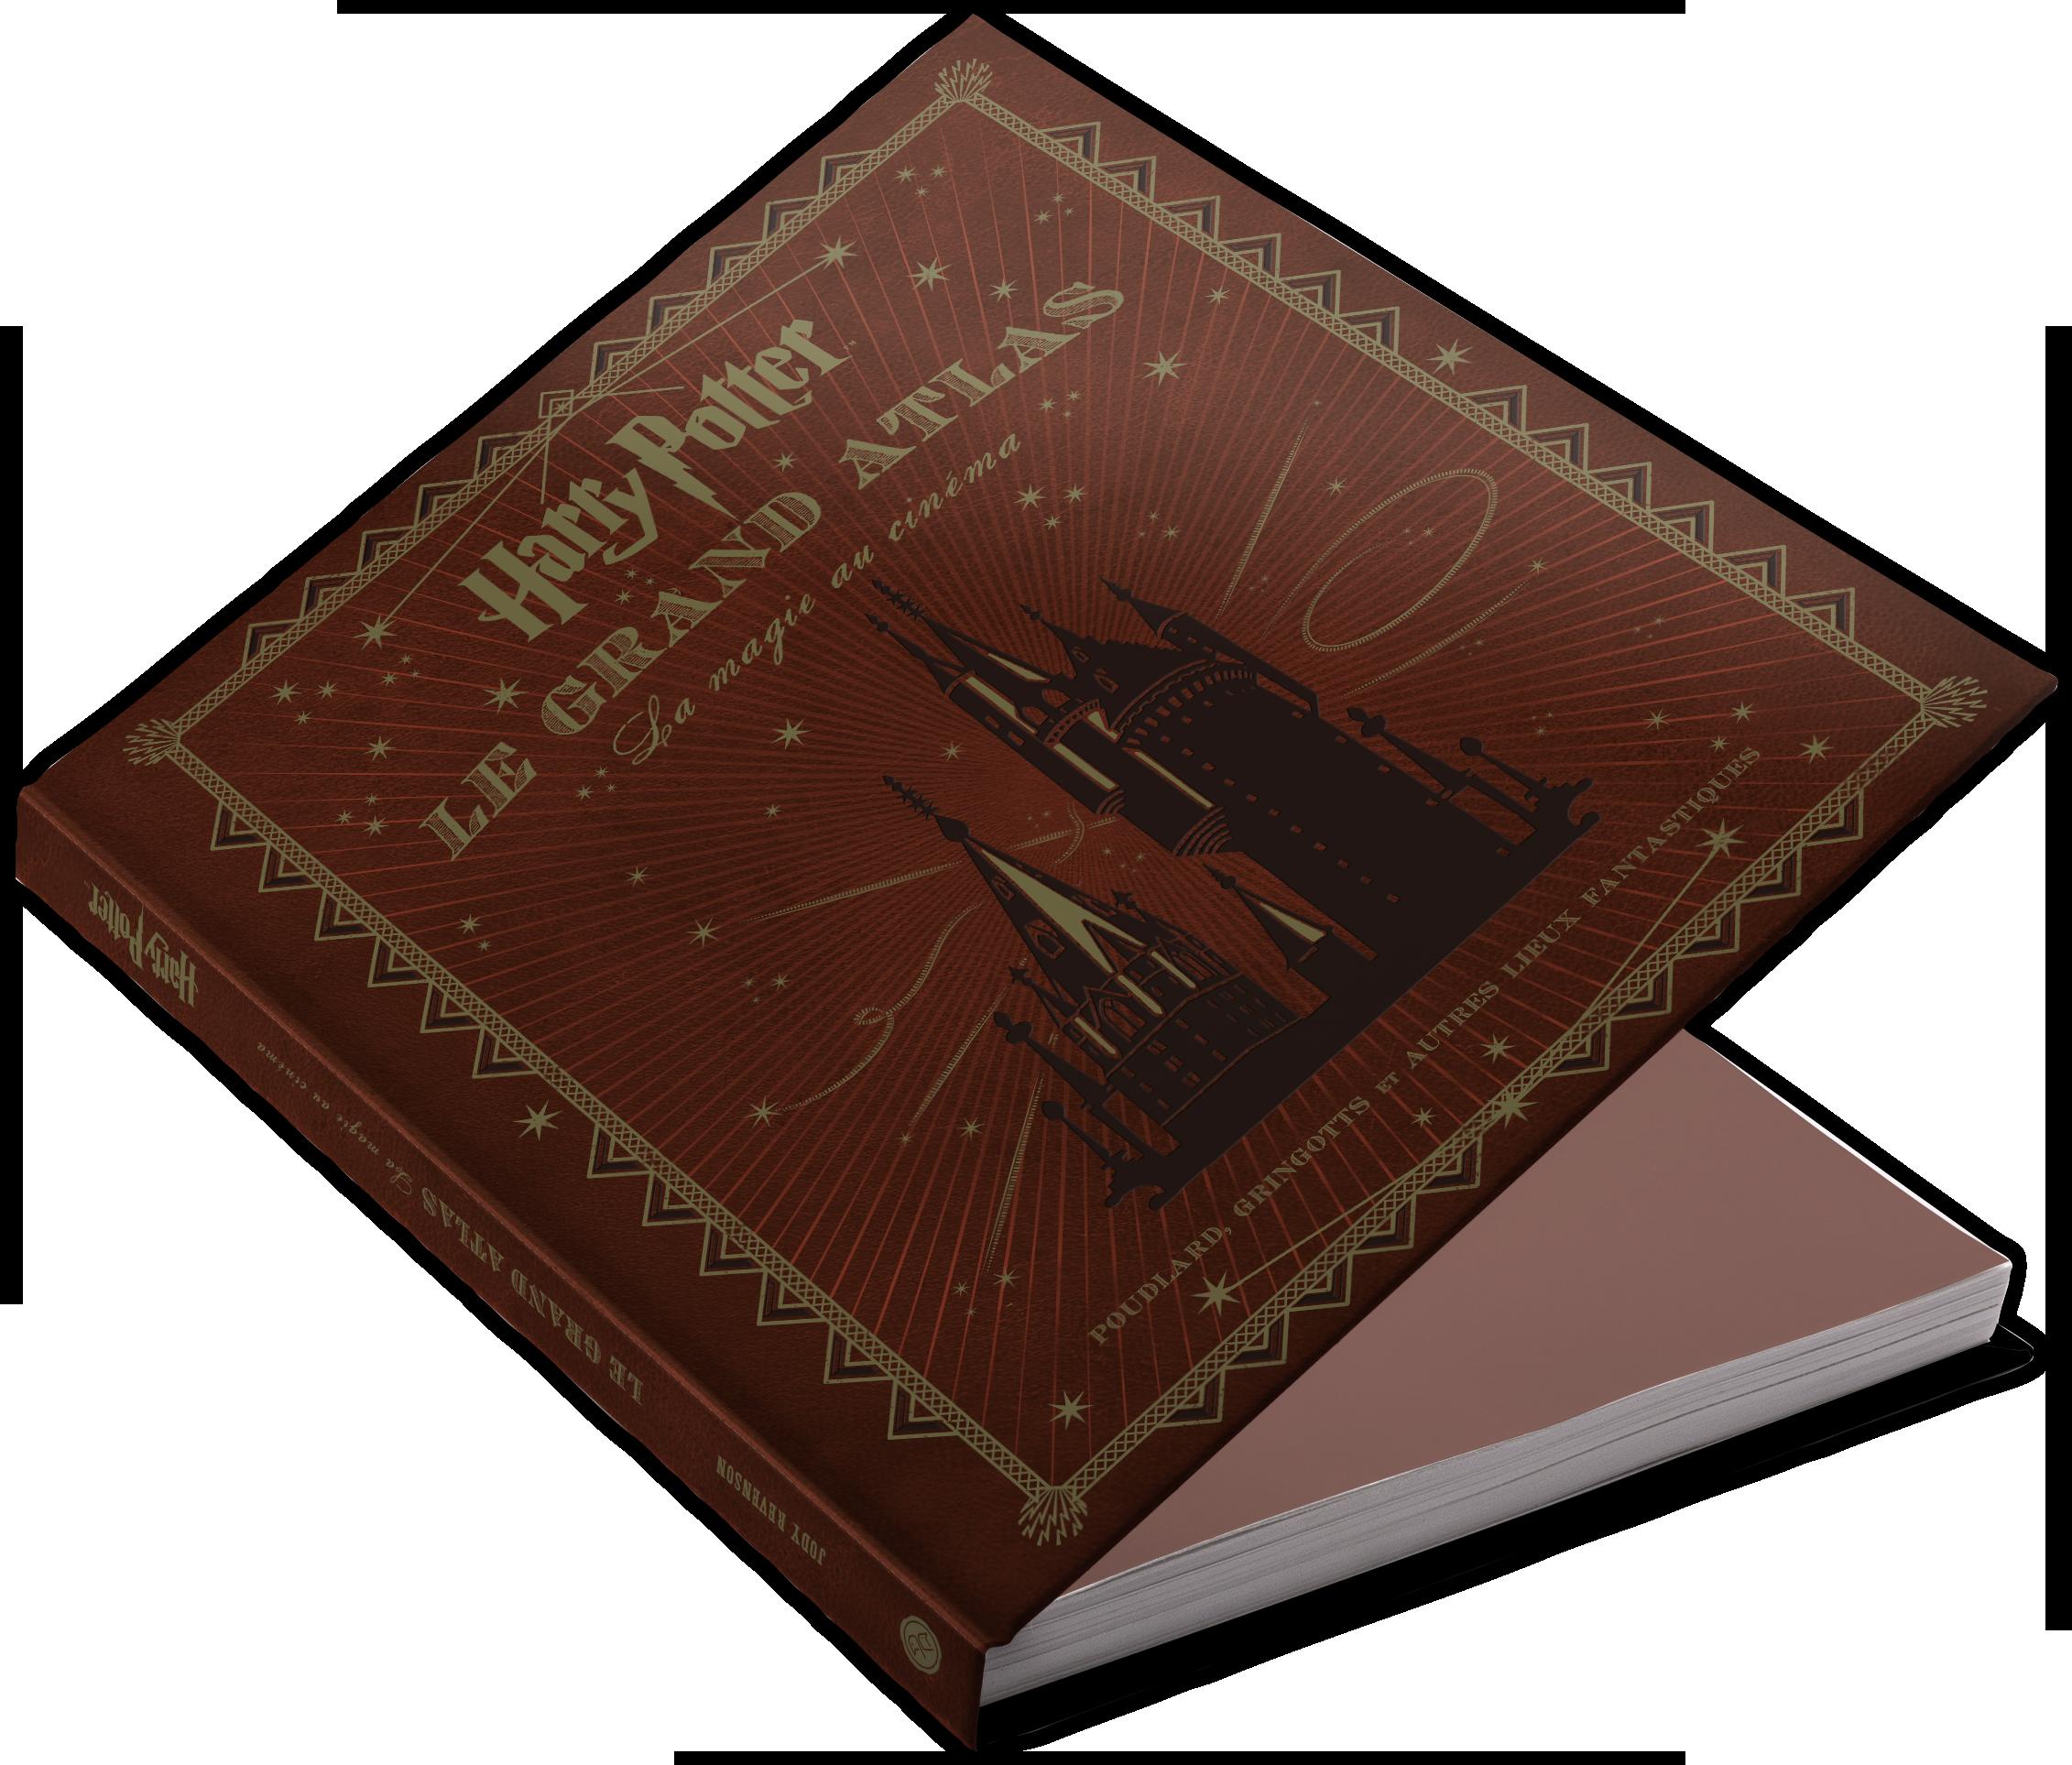 Harry Potter Book Cover Png : Huginn muninn ・ harry potter le grand atlas la magie